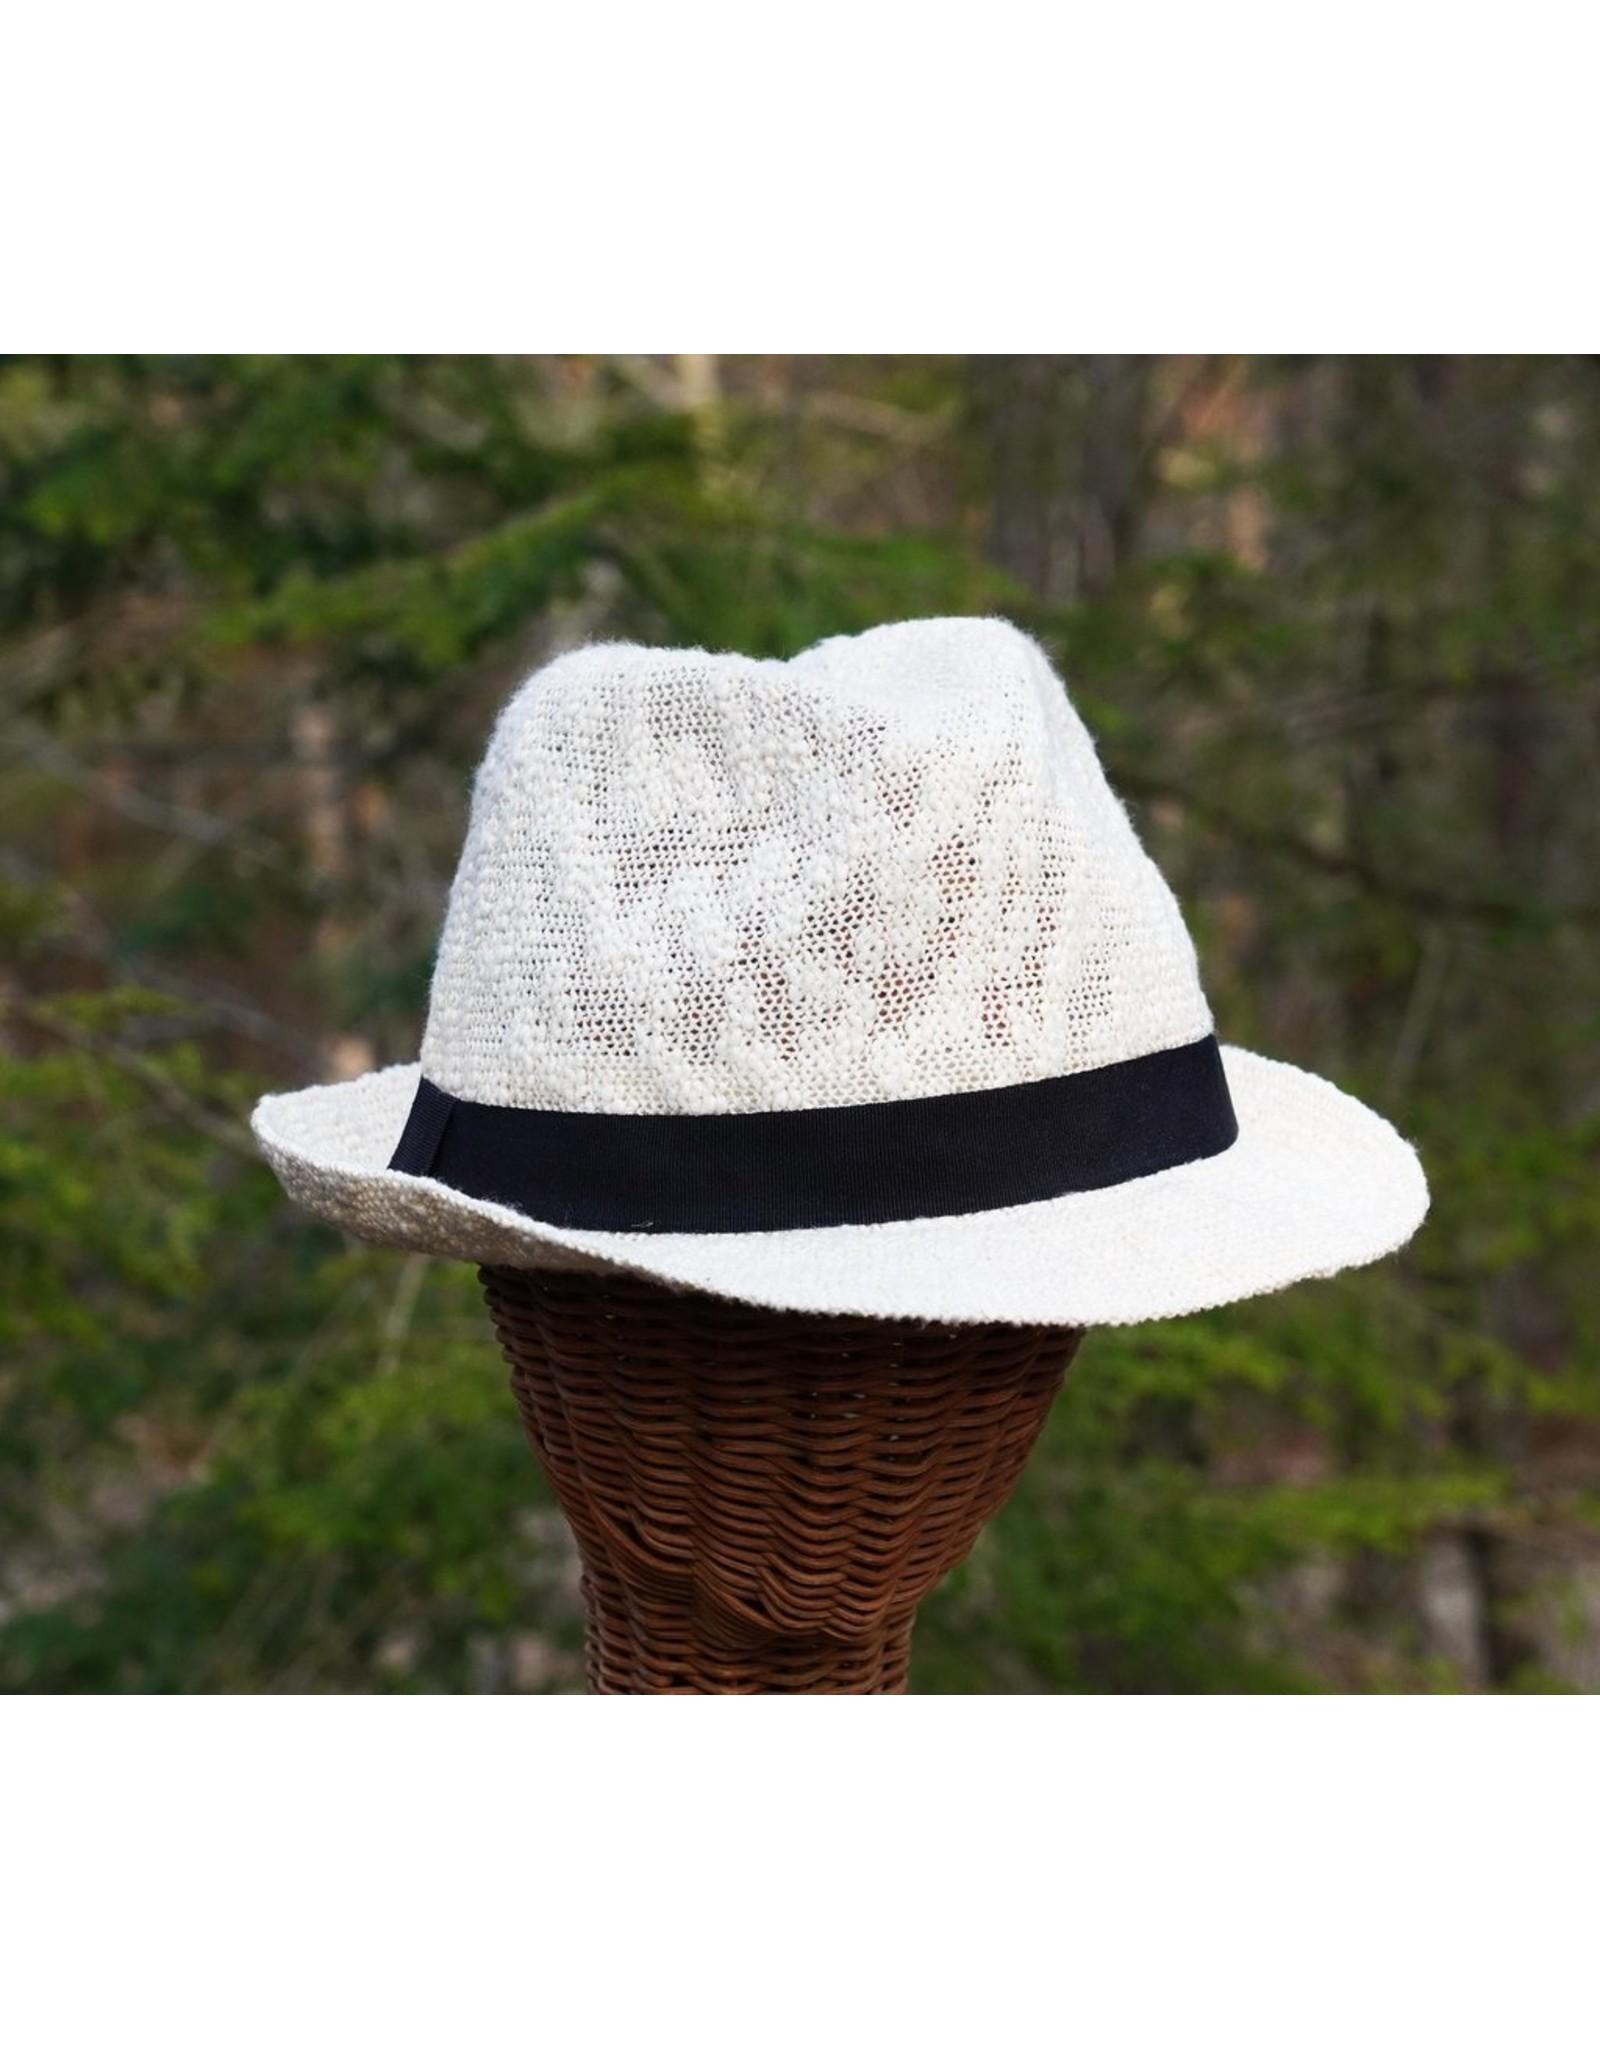 Hat Stuff Crushable Cotten Blend Fedora 3811 (S1)